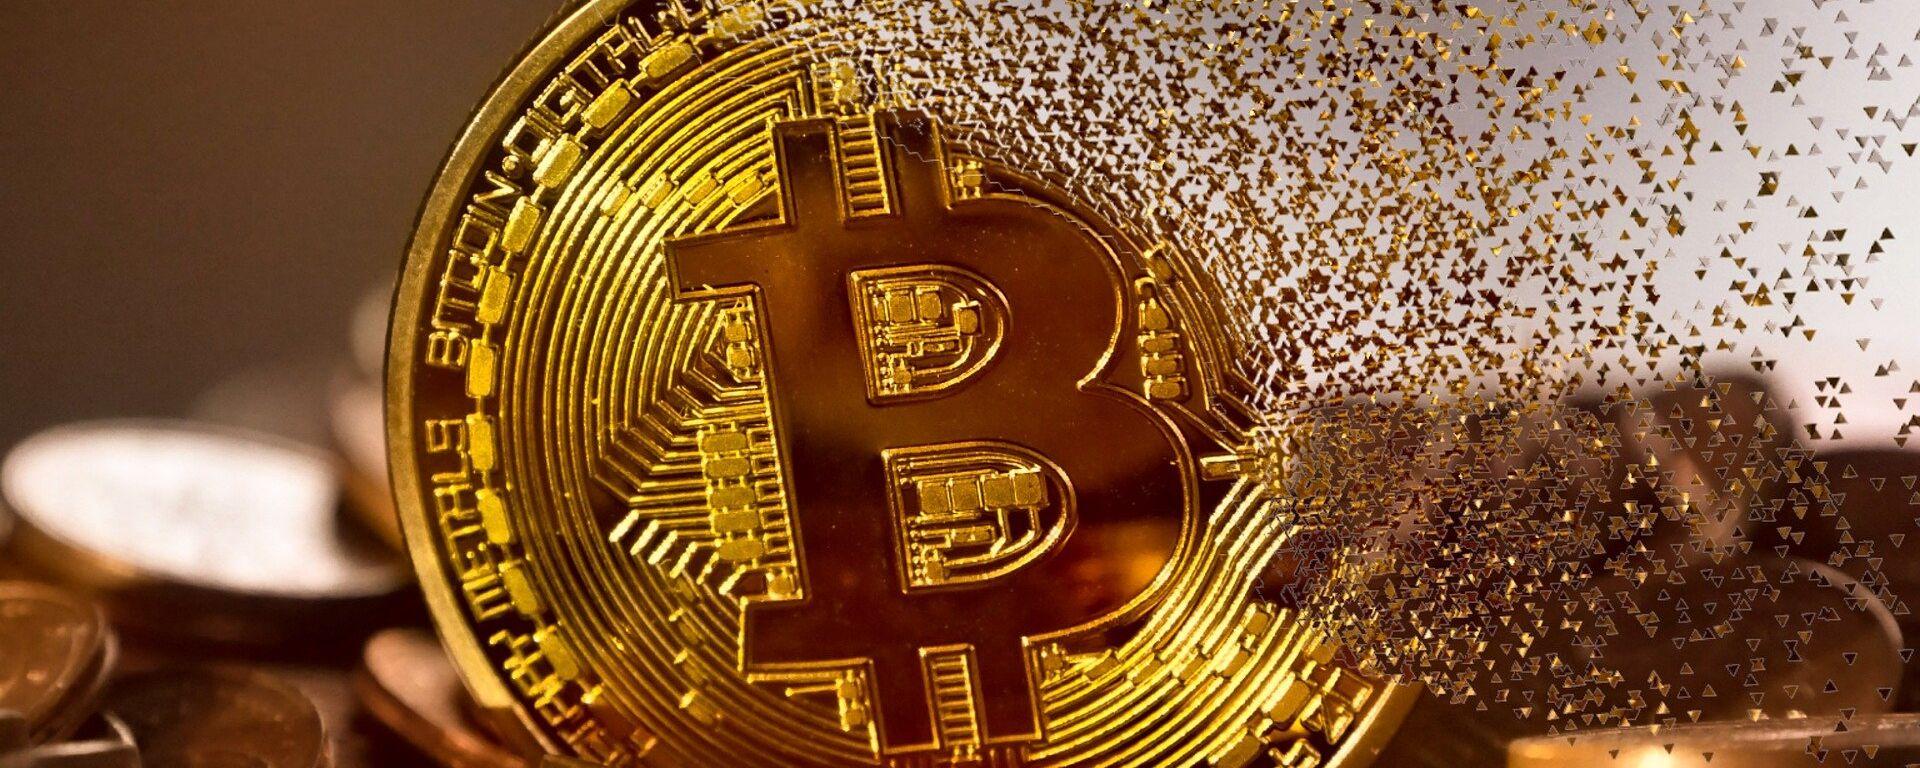 Bitcoin digital currency - Sputnik Ελλάδα, 1920, 13.08.2021